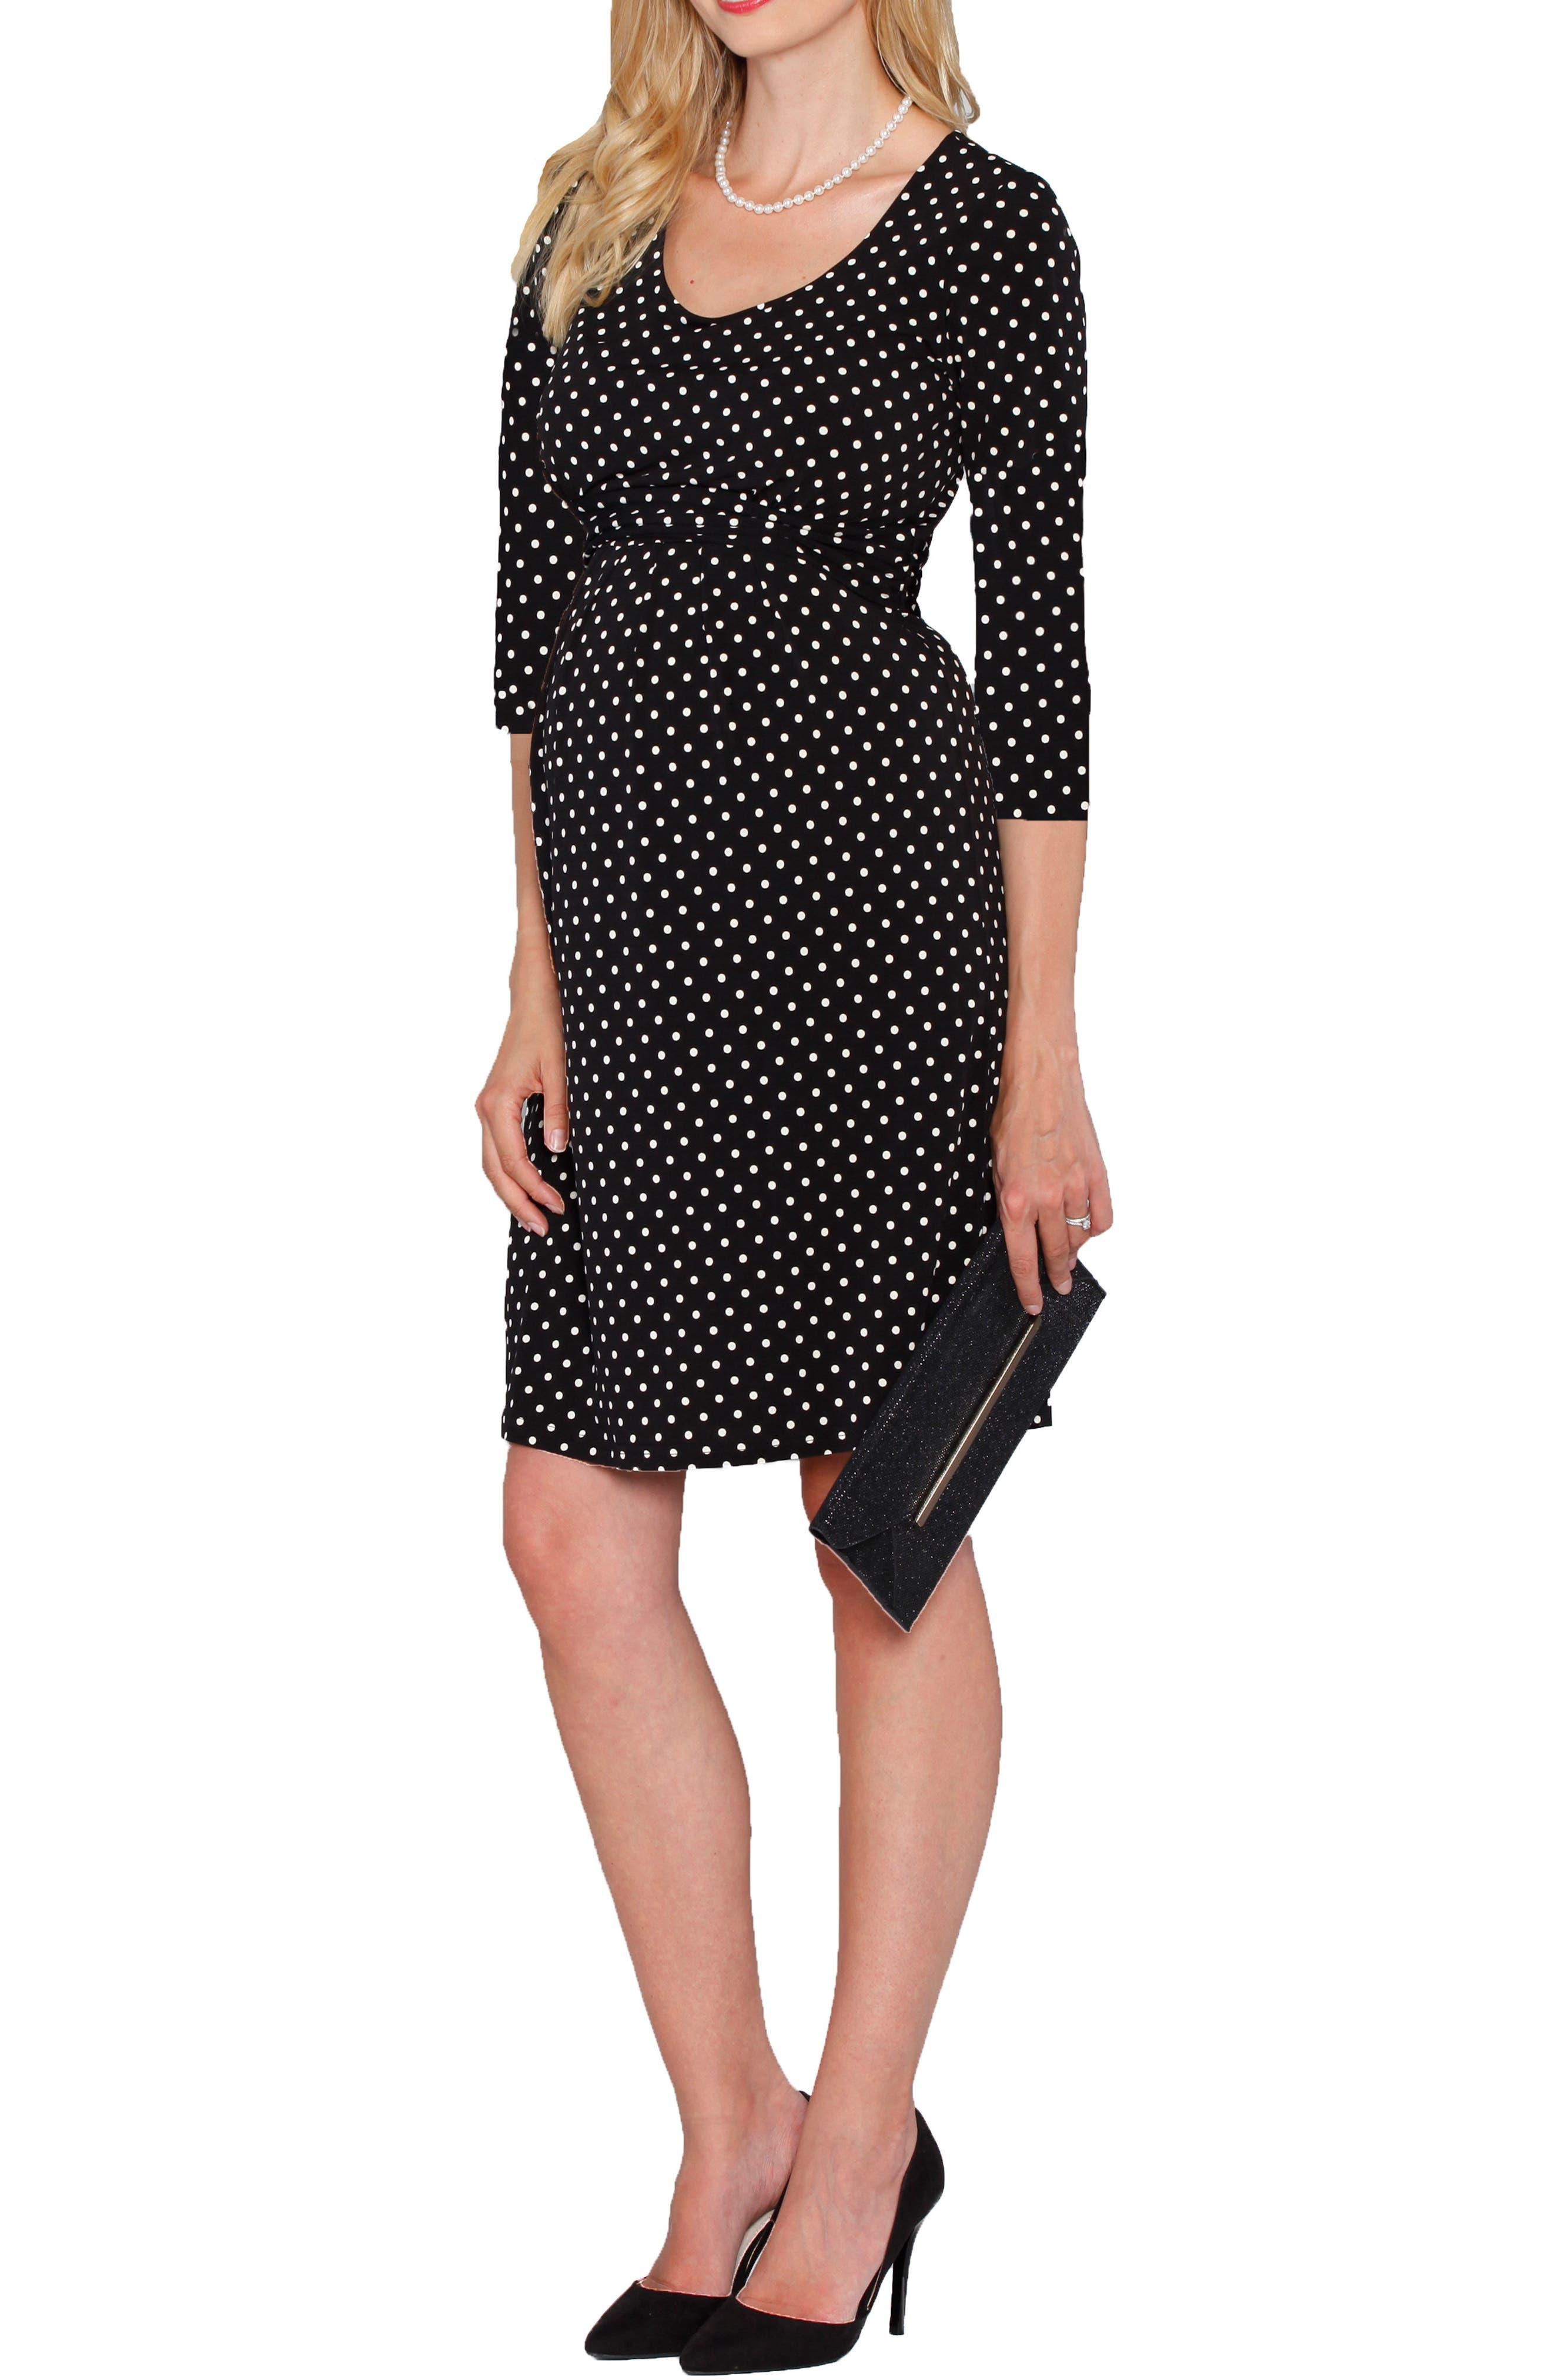 Busy Mom Maternity/Nursing Dress,                         Main,                         color, Polka Dots